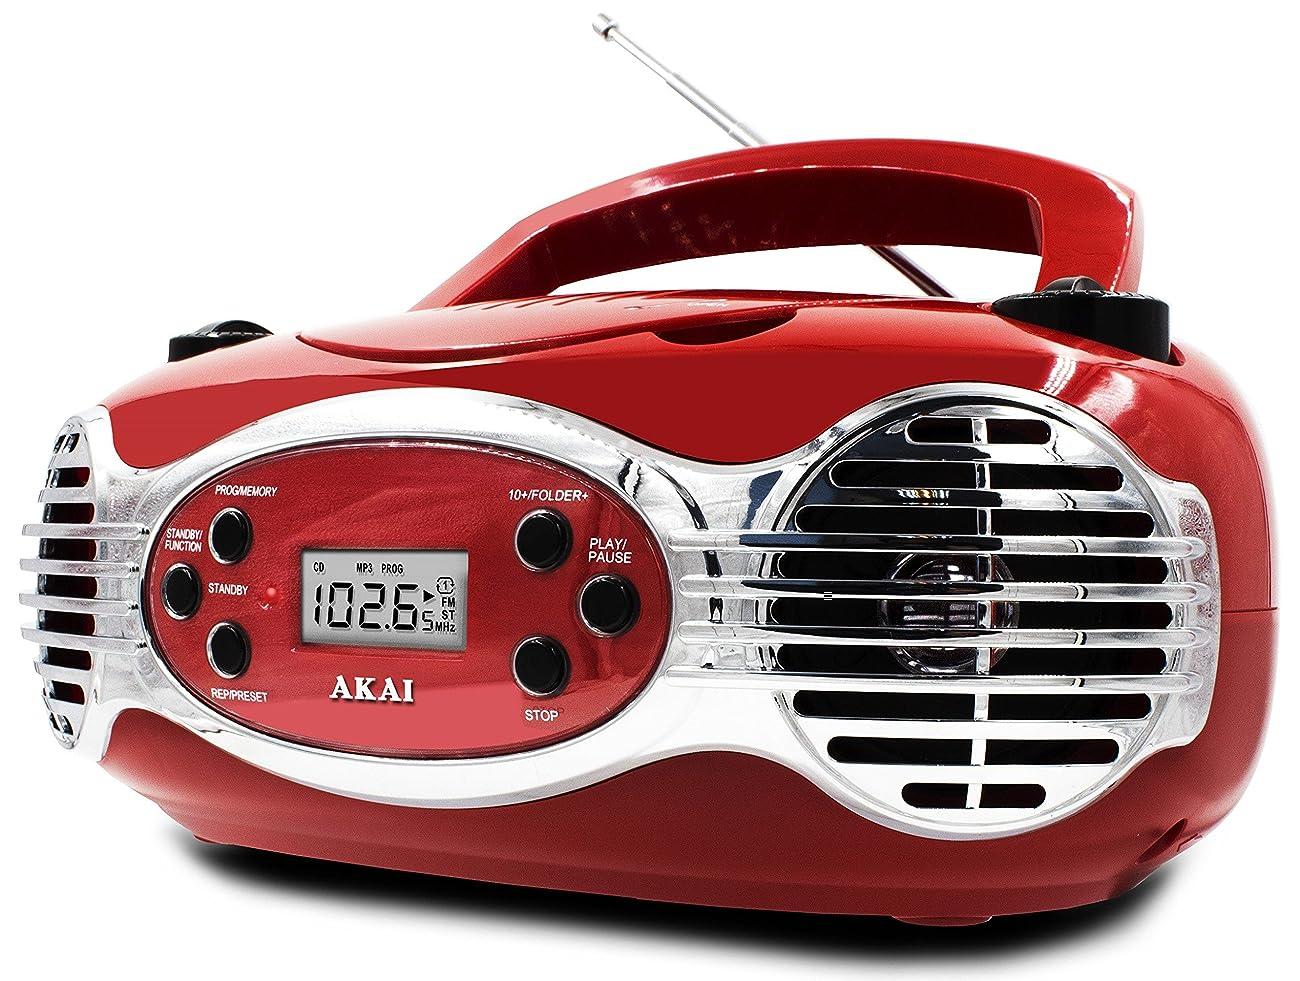 Akai CE2200R CD Boombox FM PLL Radio, Red 1